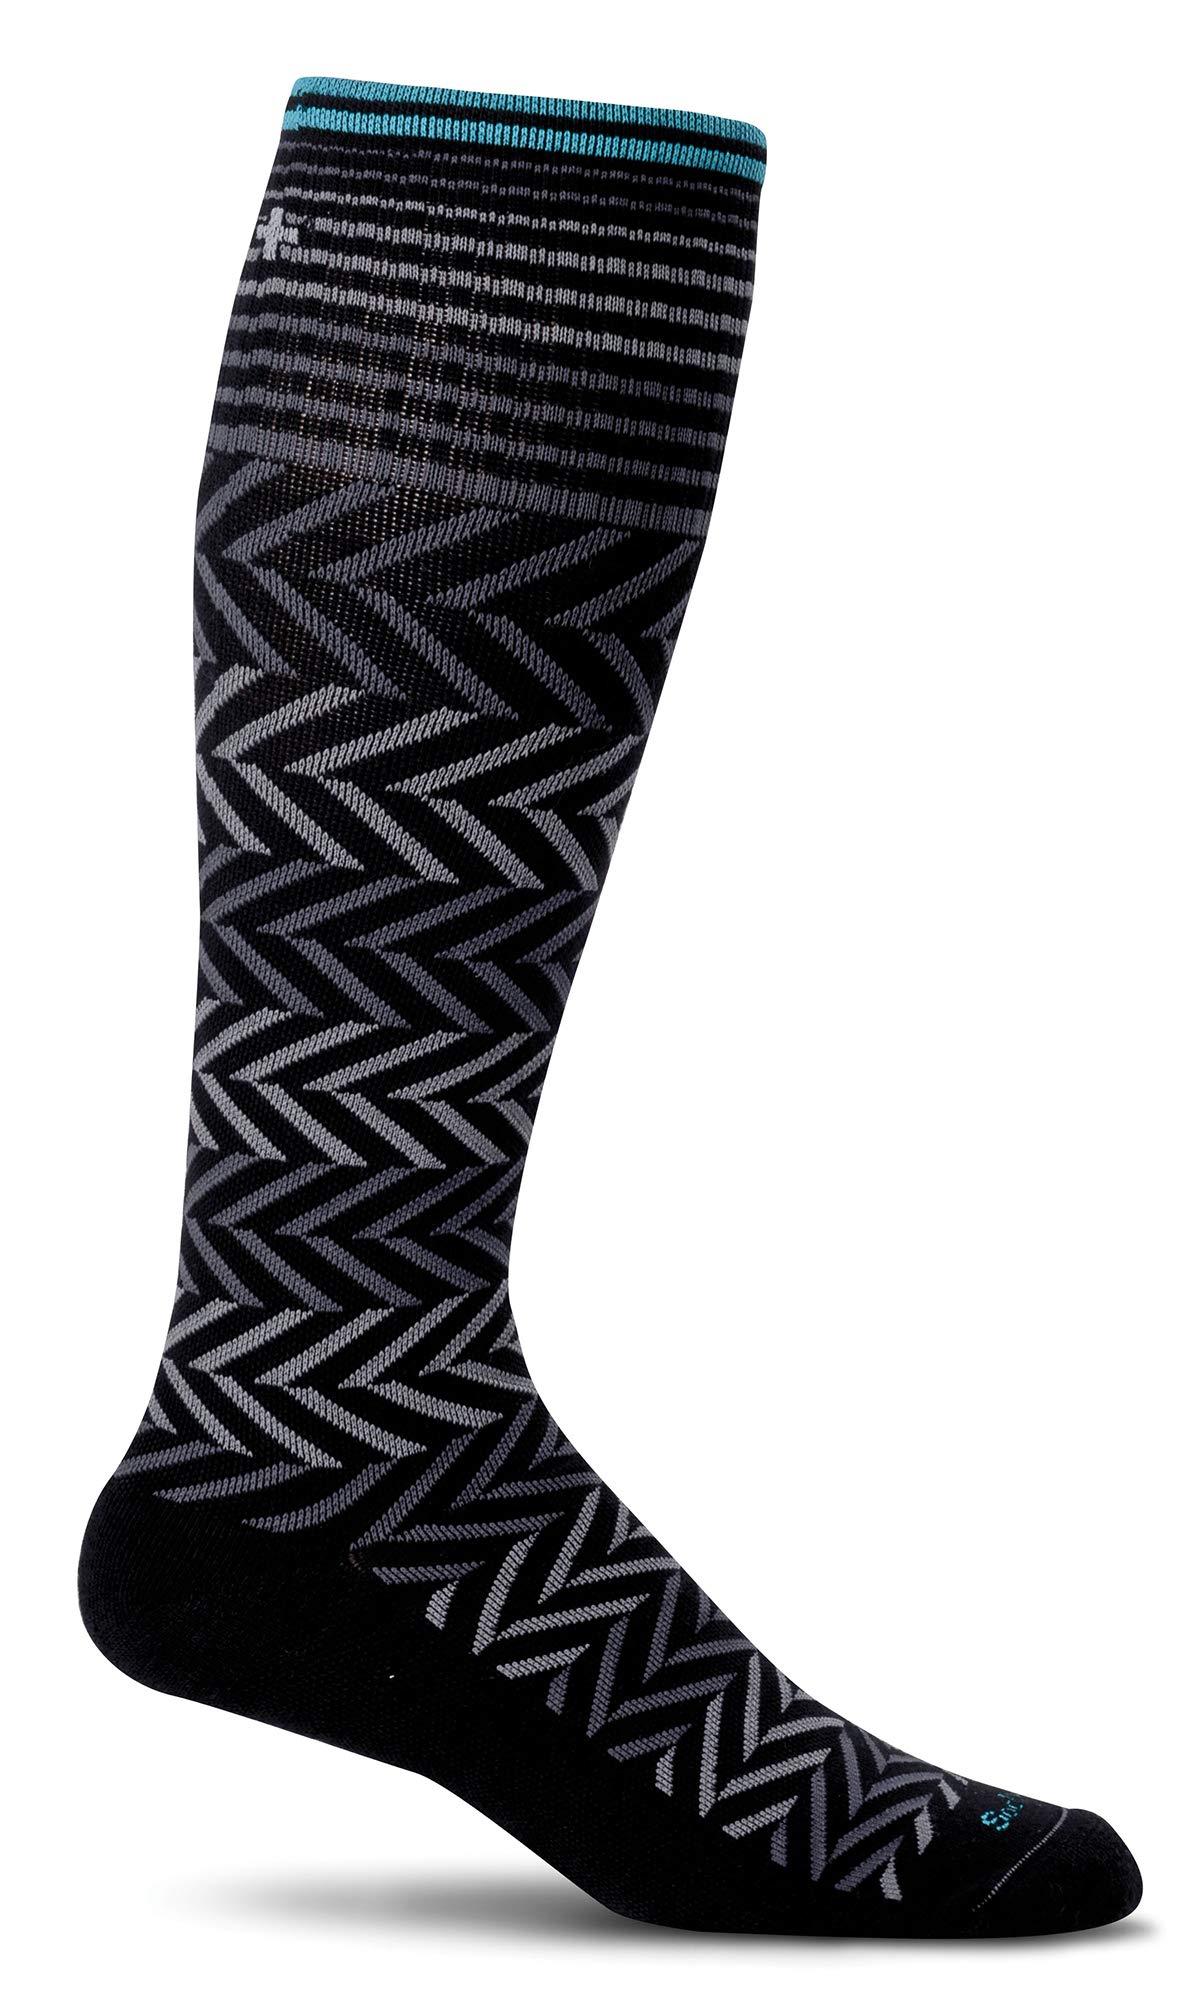 Sockwell Women's Chevron Graduated Compression Socks, Black, Small/Medium by Sockwell